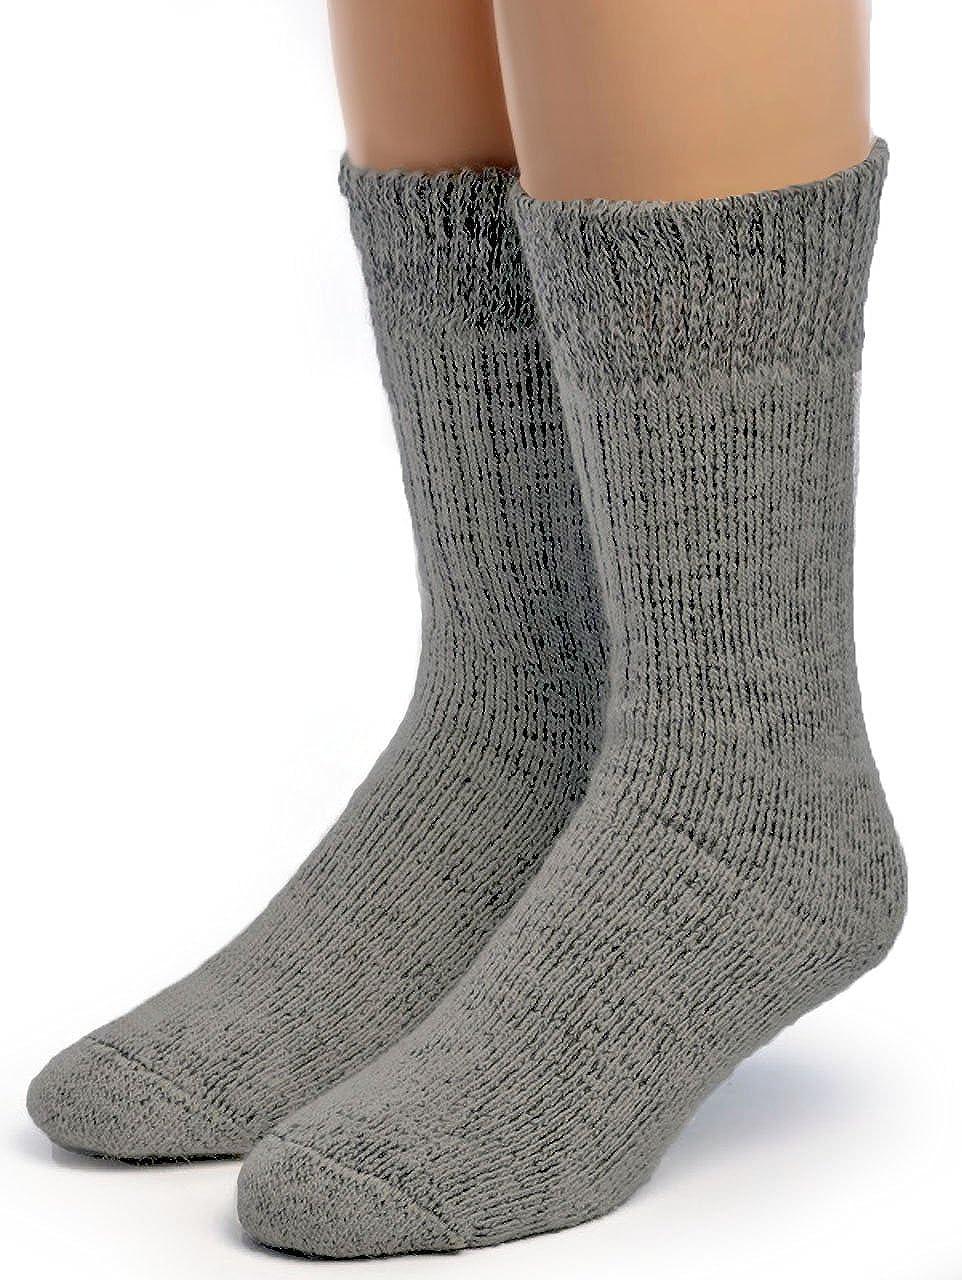 Warrior Alpaca Socks - Men's Ultimate Alpaca Socks with Comfort Band